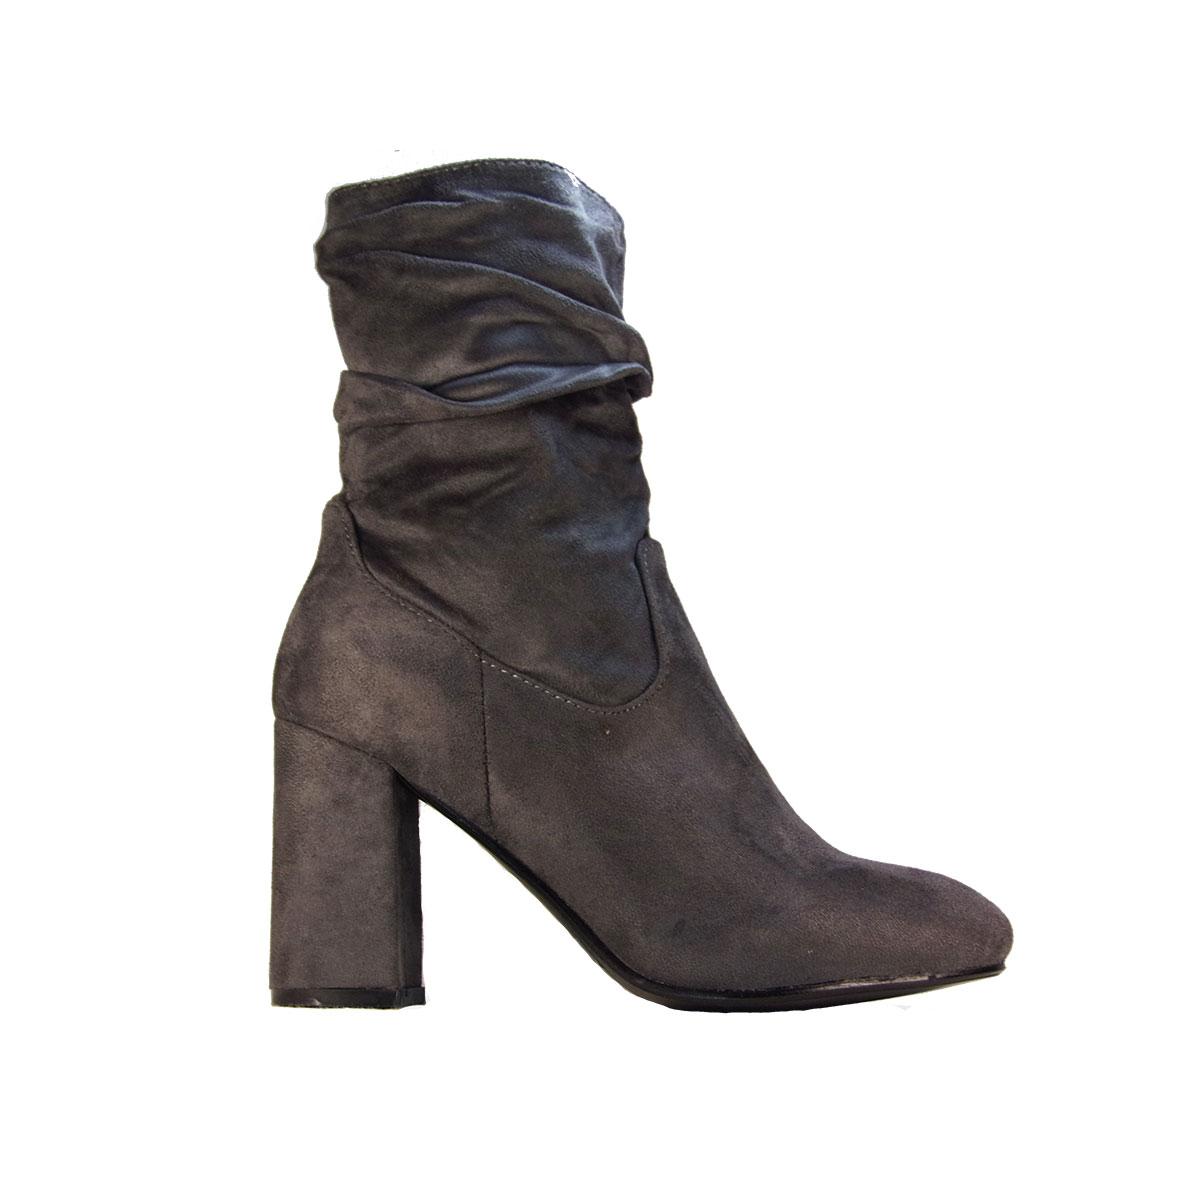 c571a1c1de1 ILoveMyShoes S-302 Γυναικεία Μποτάκια Χοντρό Τακούνι Suede Γκρι